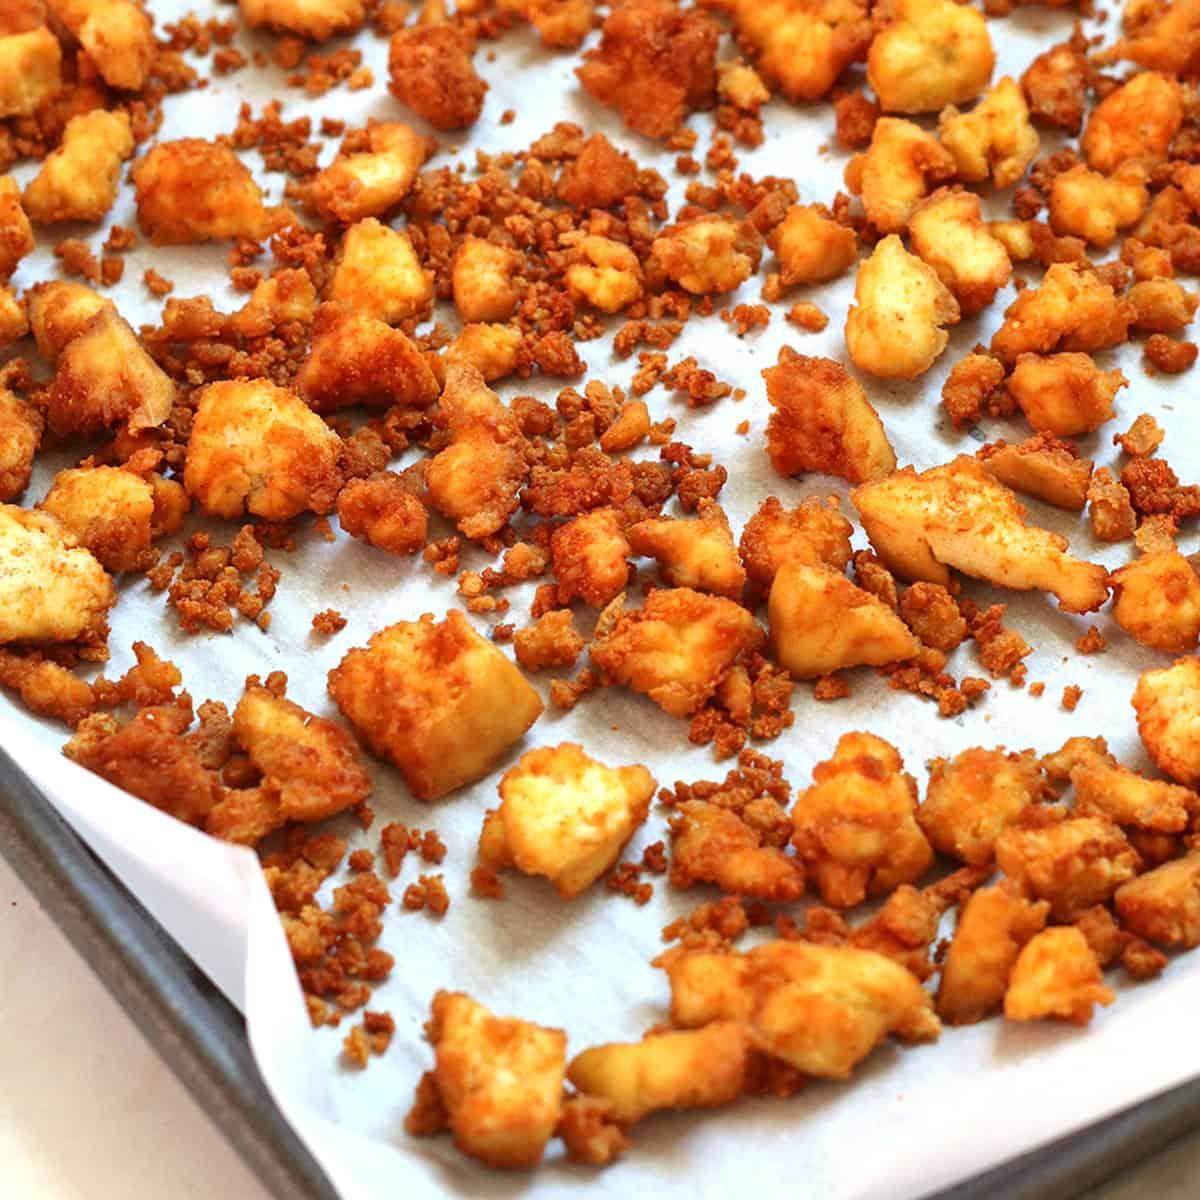 baked tofu crumbles